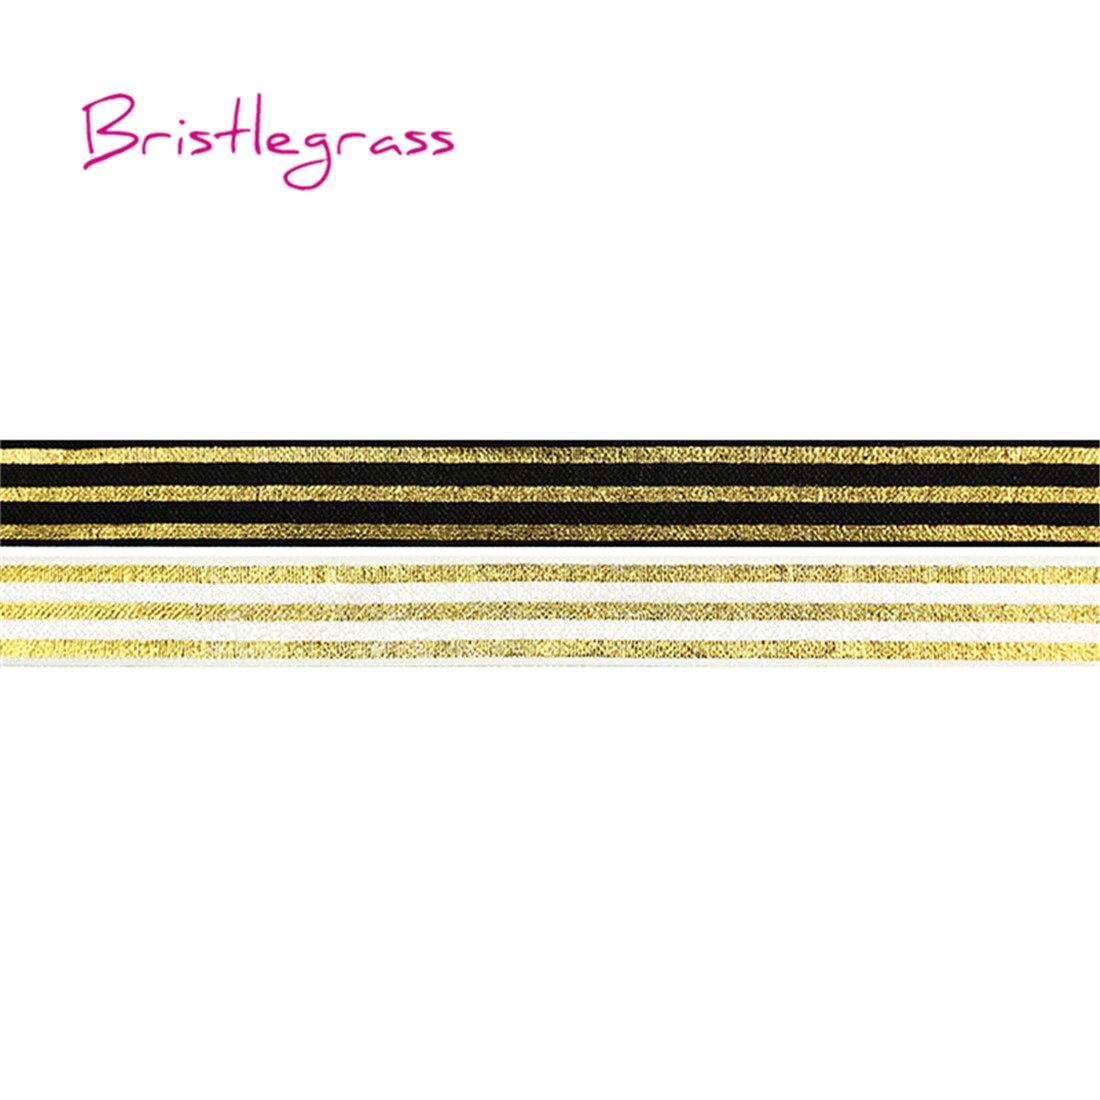 "BRISTLEGRASS 5 Yard 5/8"" 15mm Gold Line Stripe Foil Print Shiny Fold Over Elastics FOE Spandex Satin Band Tutu Dress Sewing Trim"